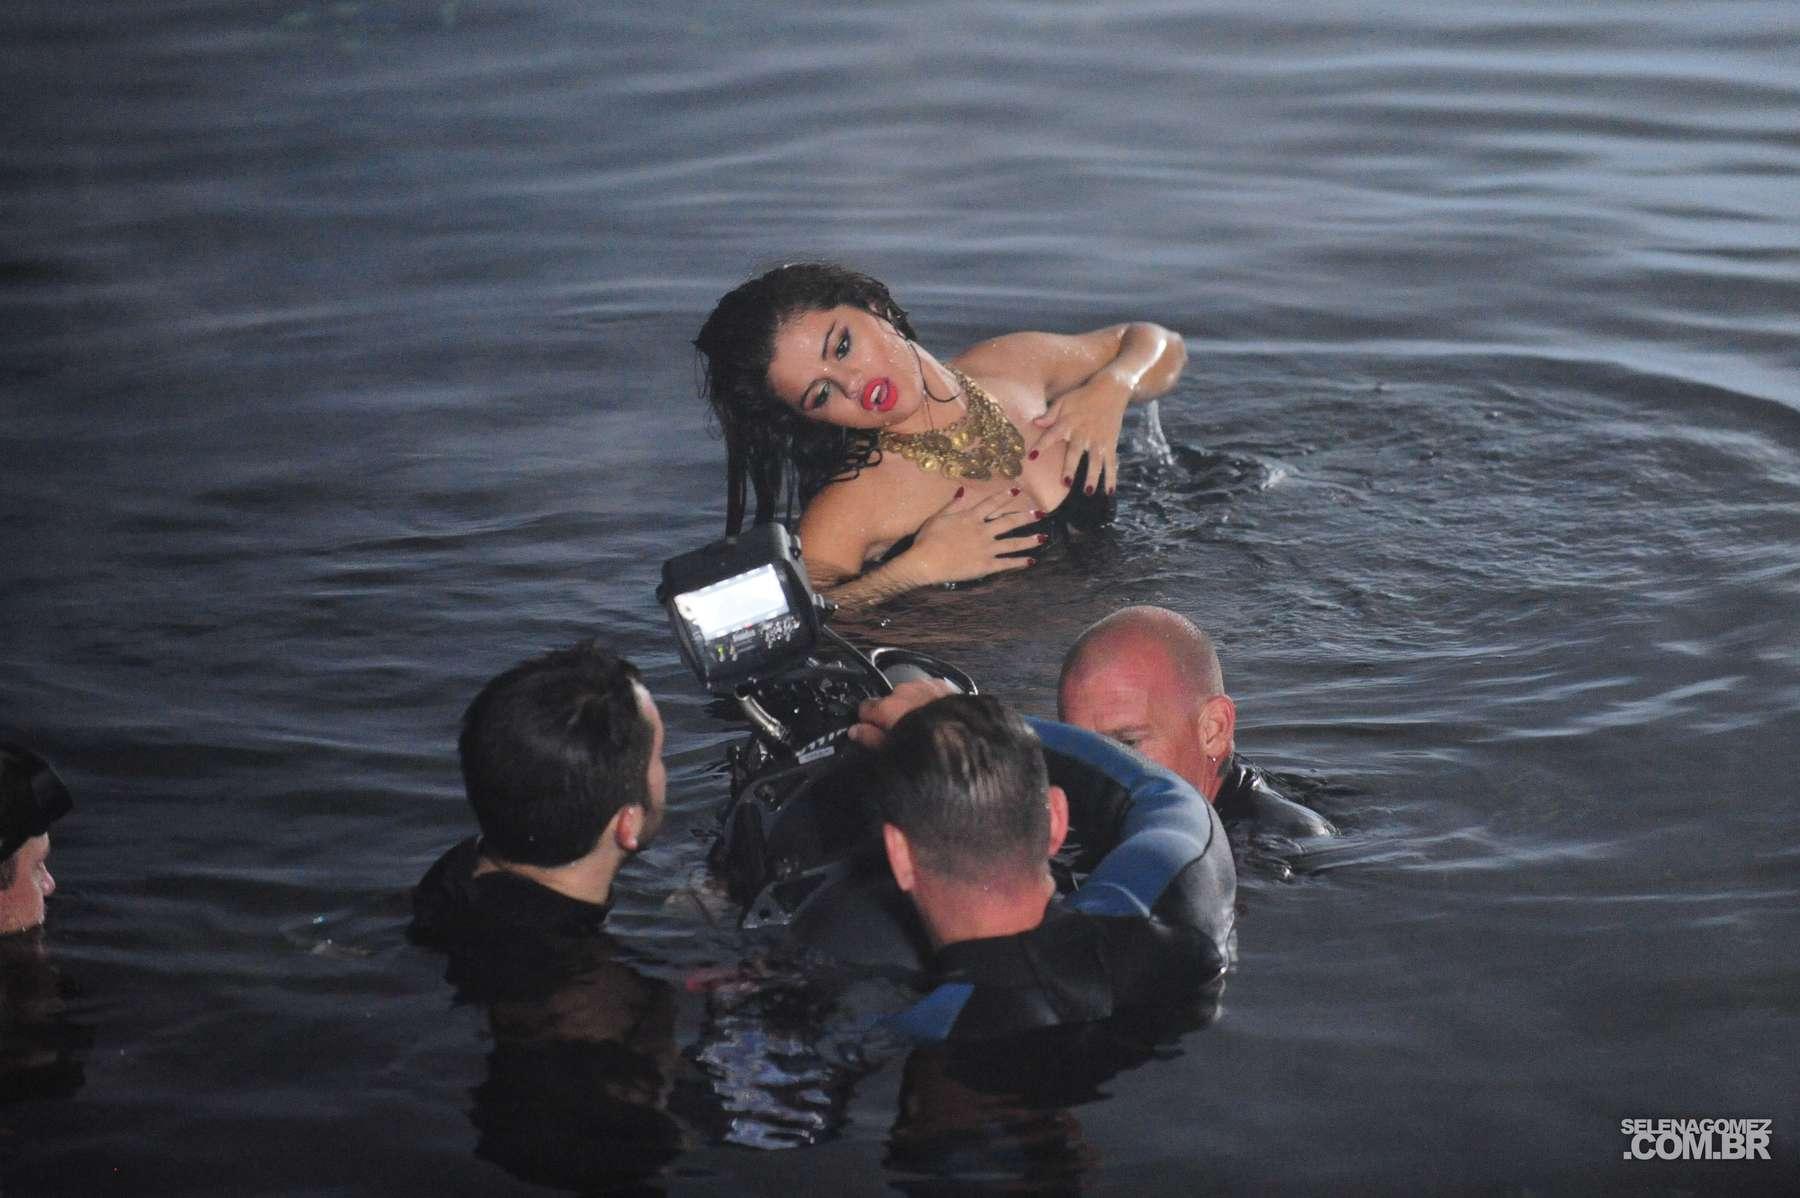 Selena Gomez 2013 : Selena Gomez – Come and Get It PhotoShot and backstage -24